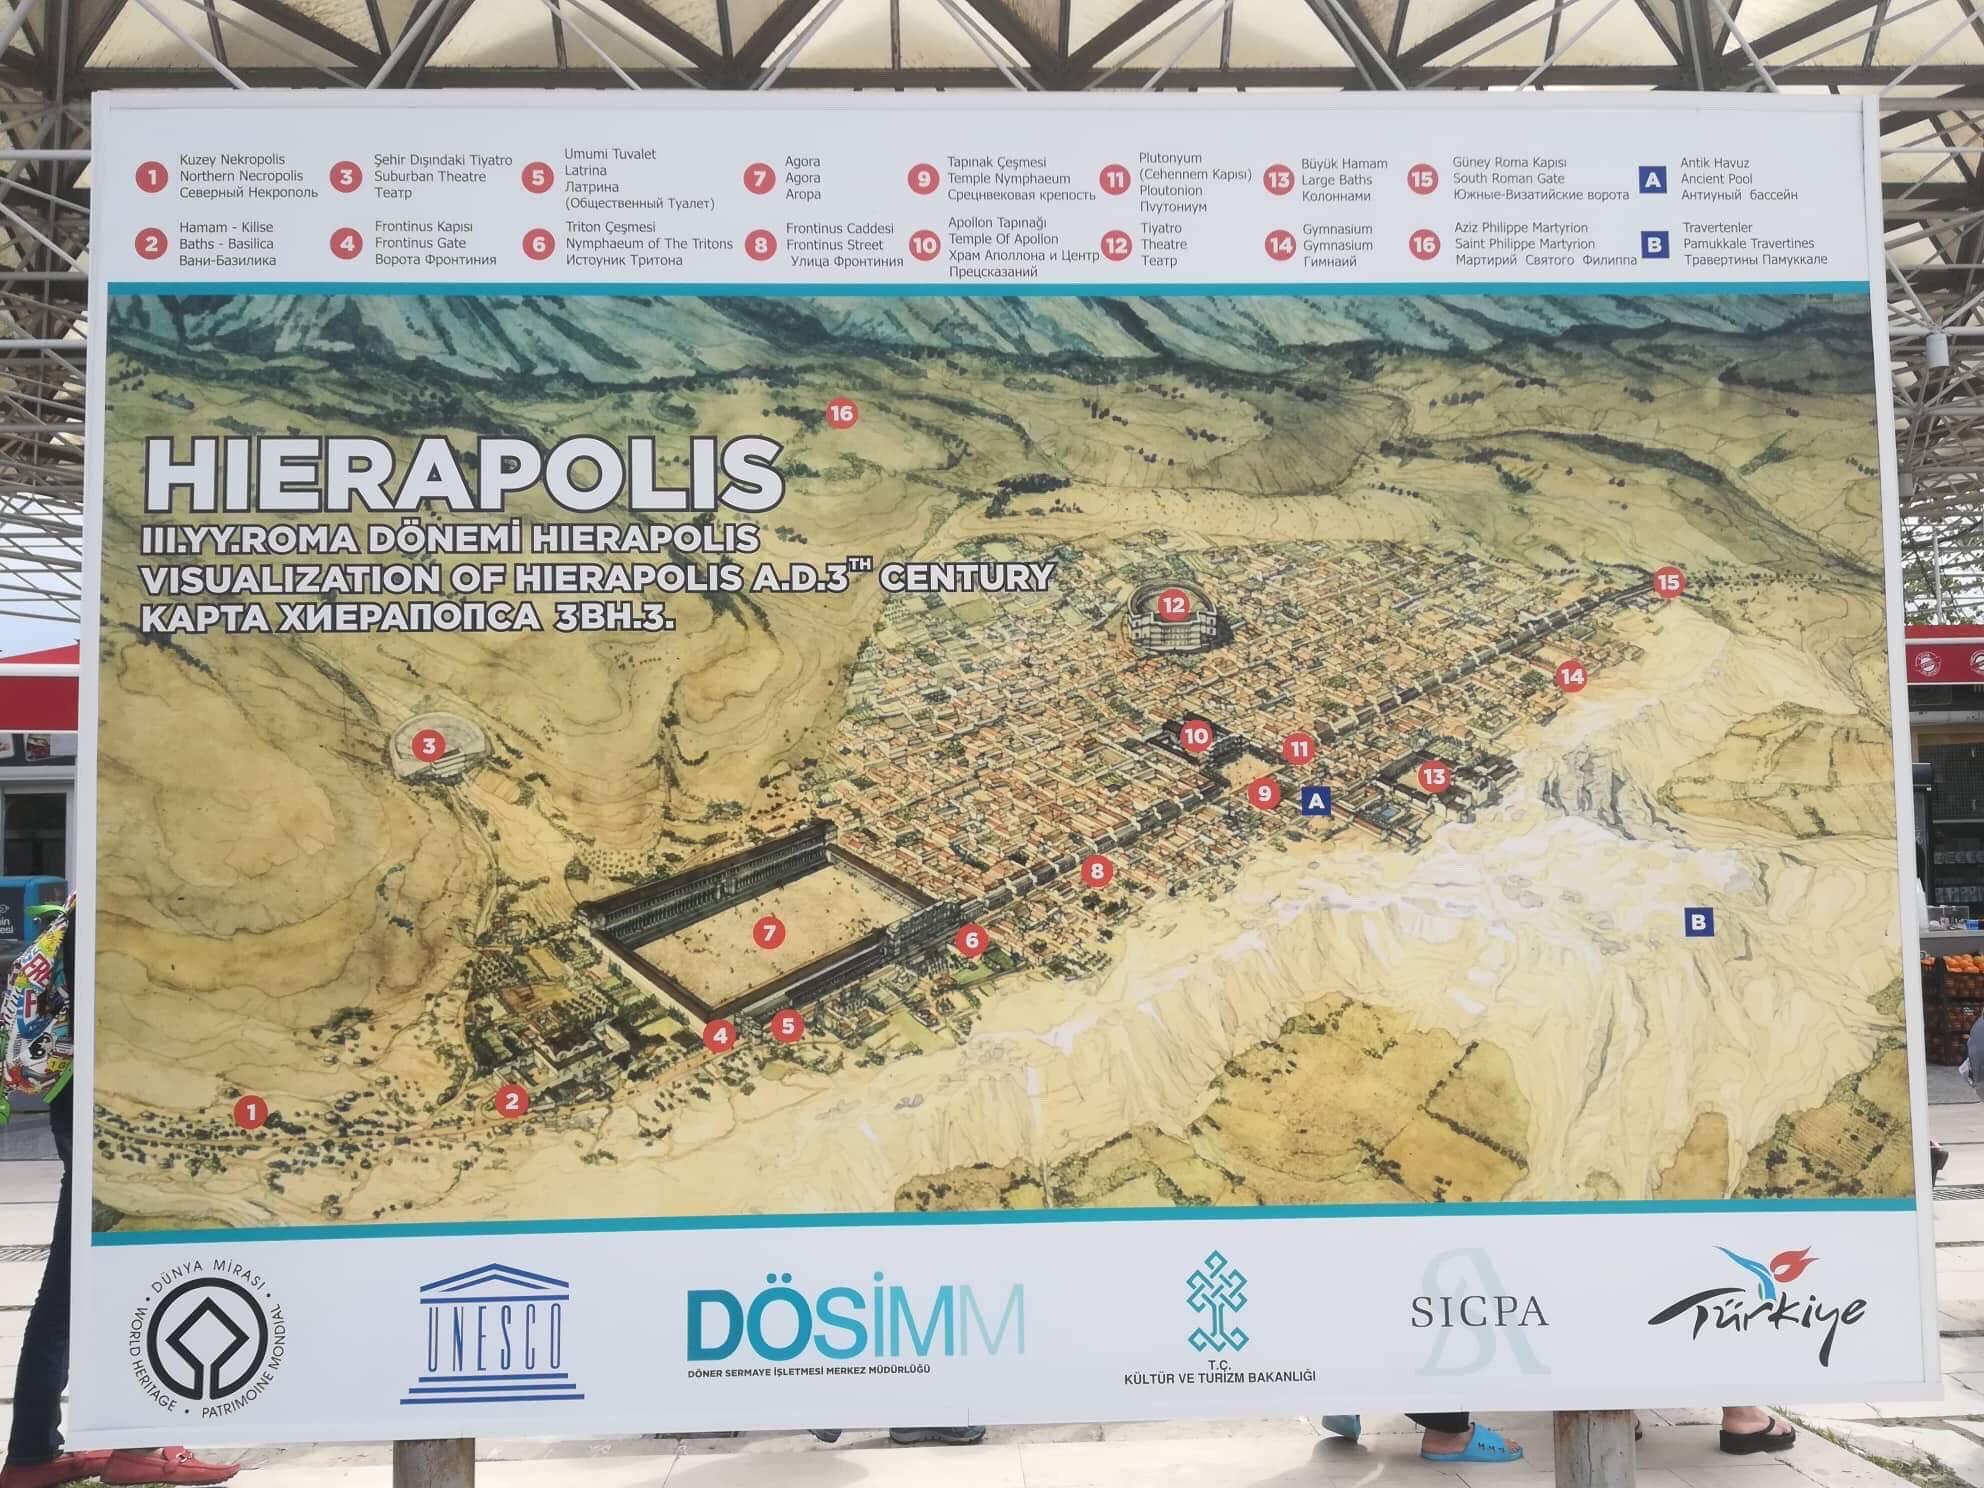 Pamukkale Hierapolis Kort Dansk I Tyrkiet